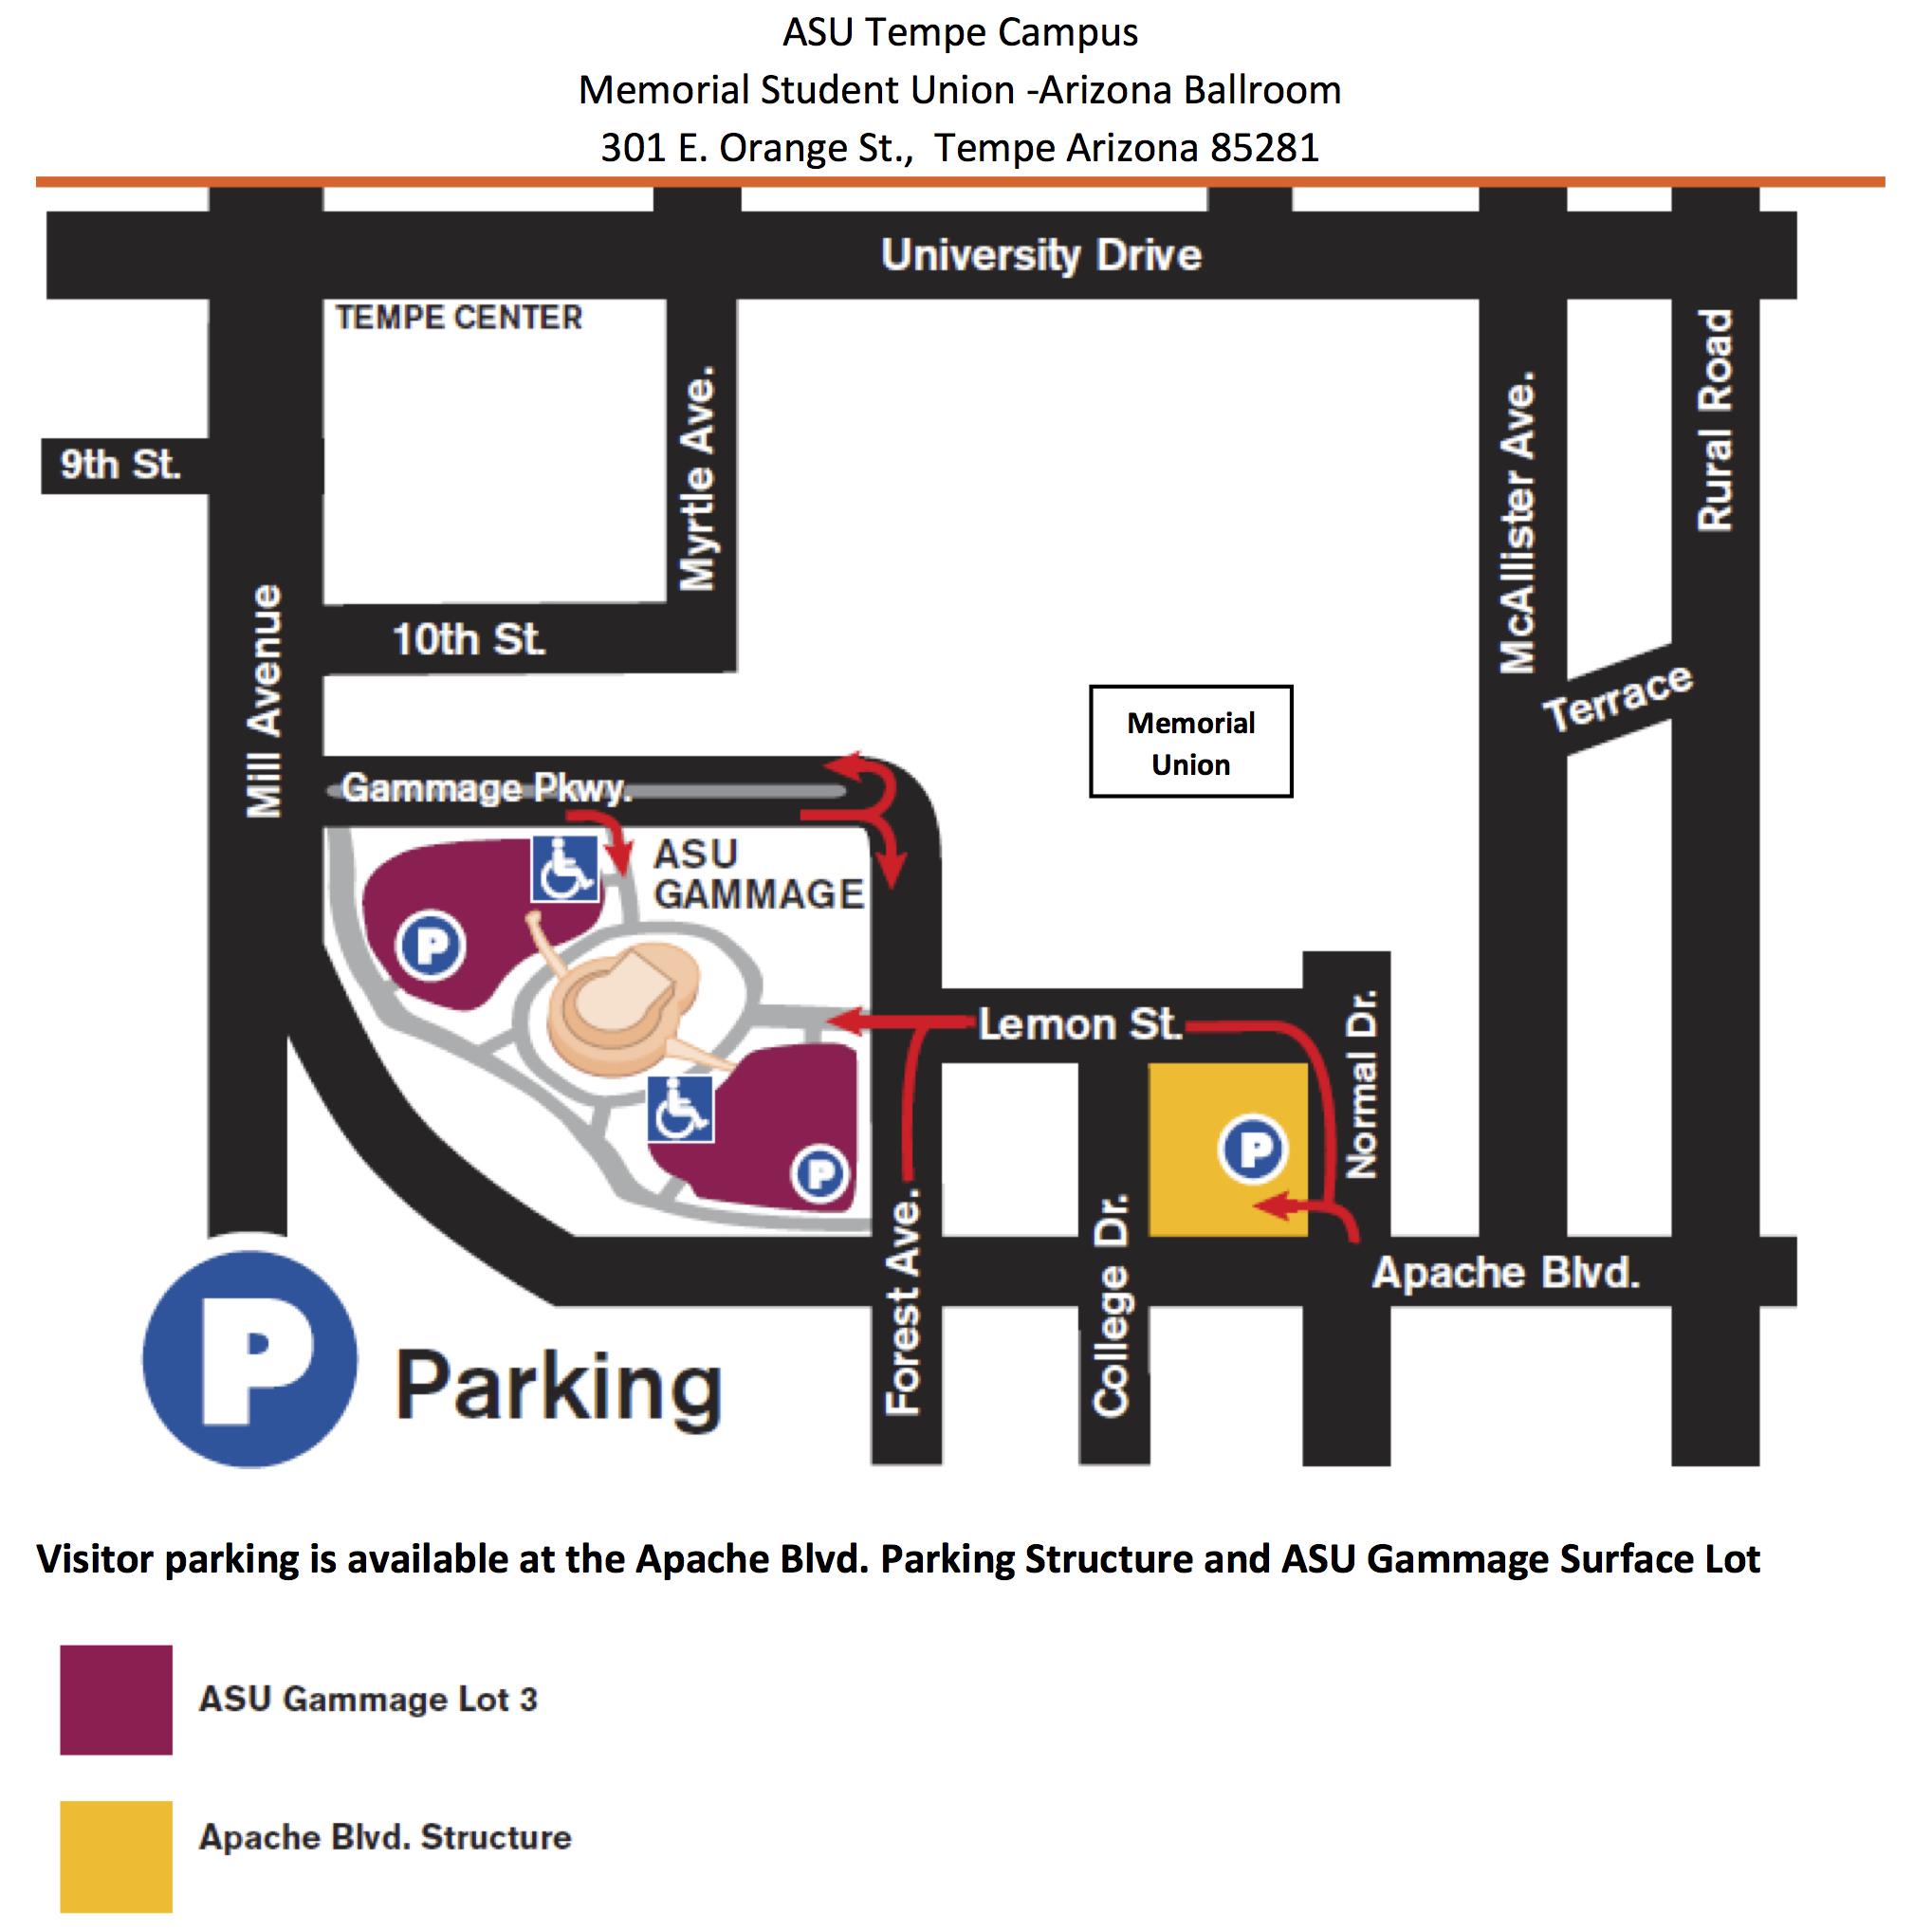 asu-tempe-campus-map-2